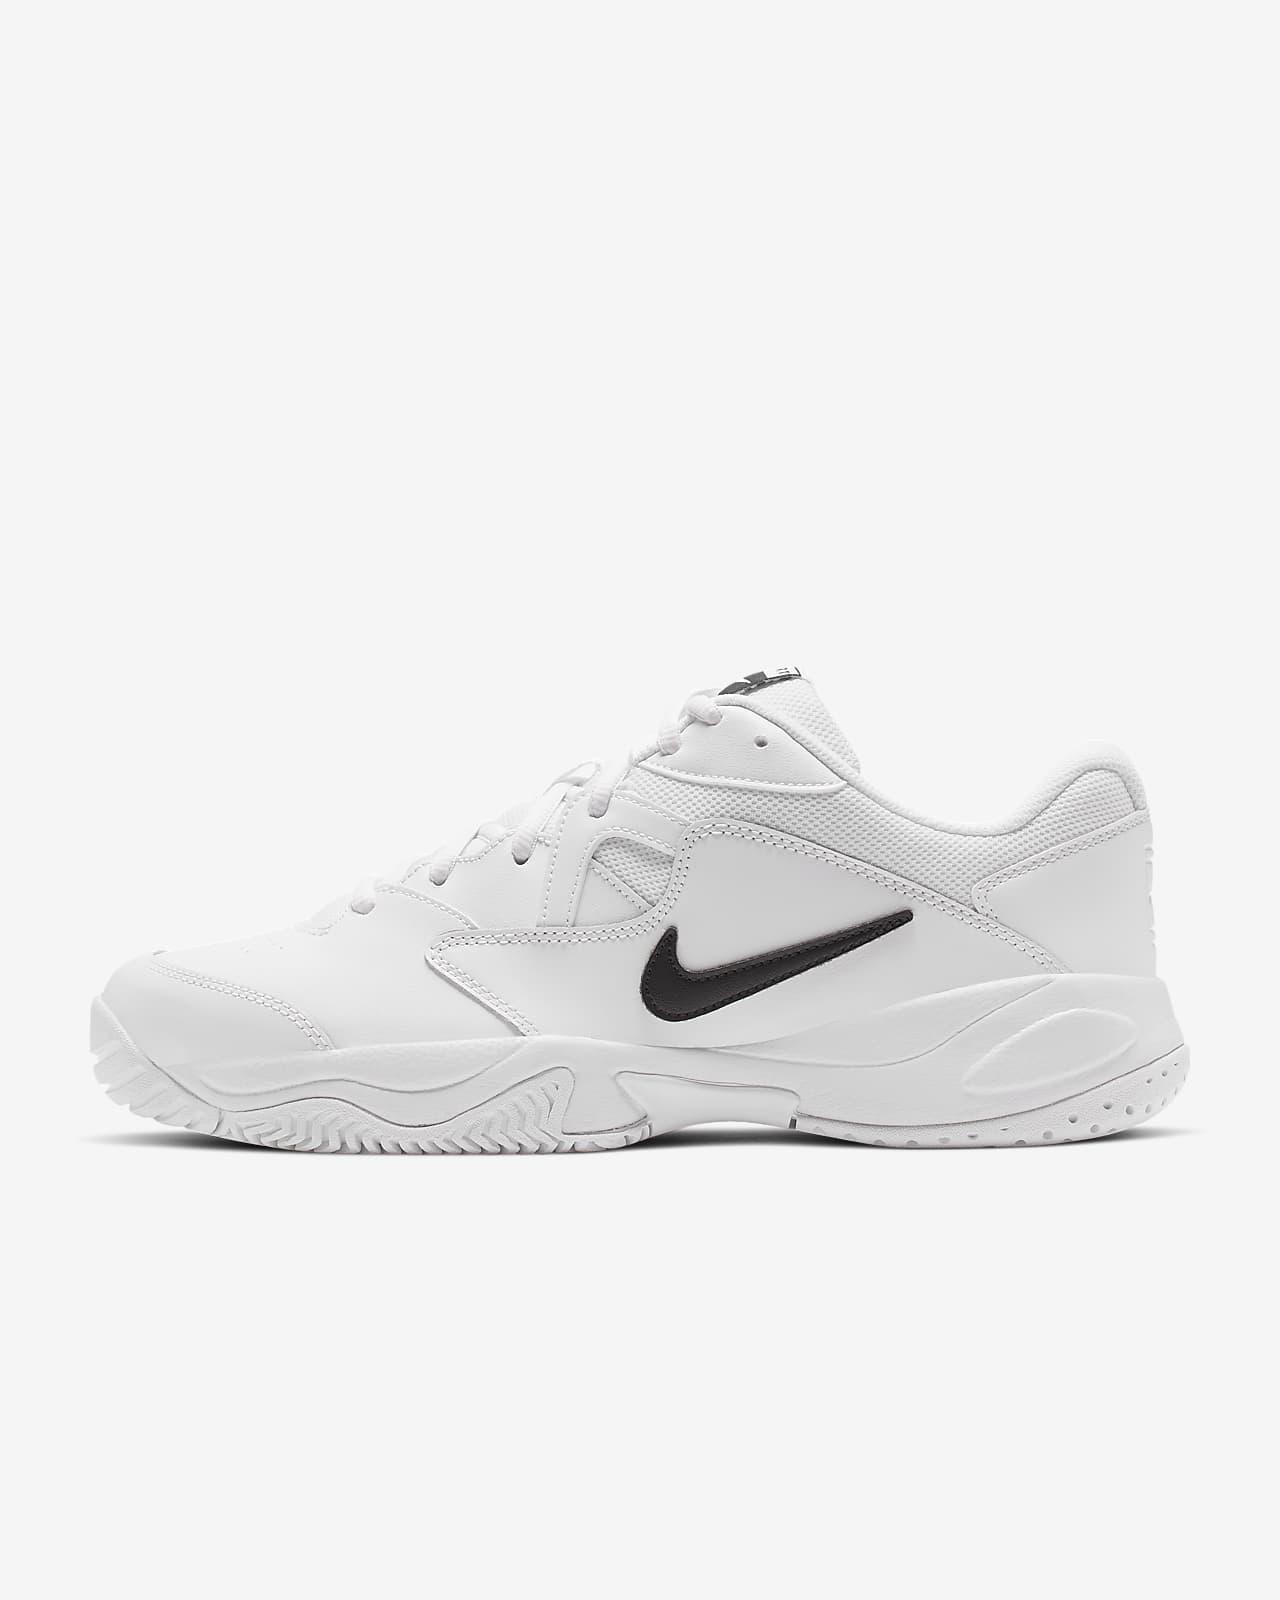 NikeCourt Lite 2 男款硬地球場網球鞋